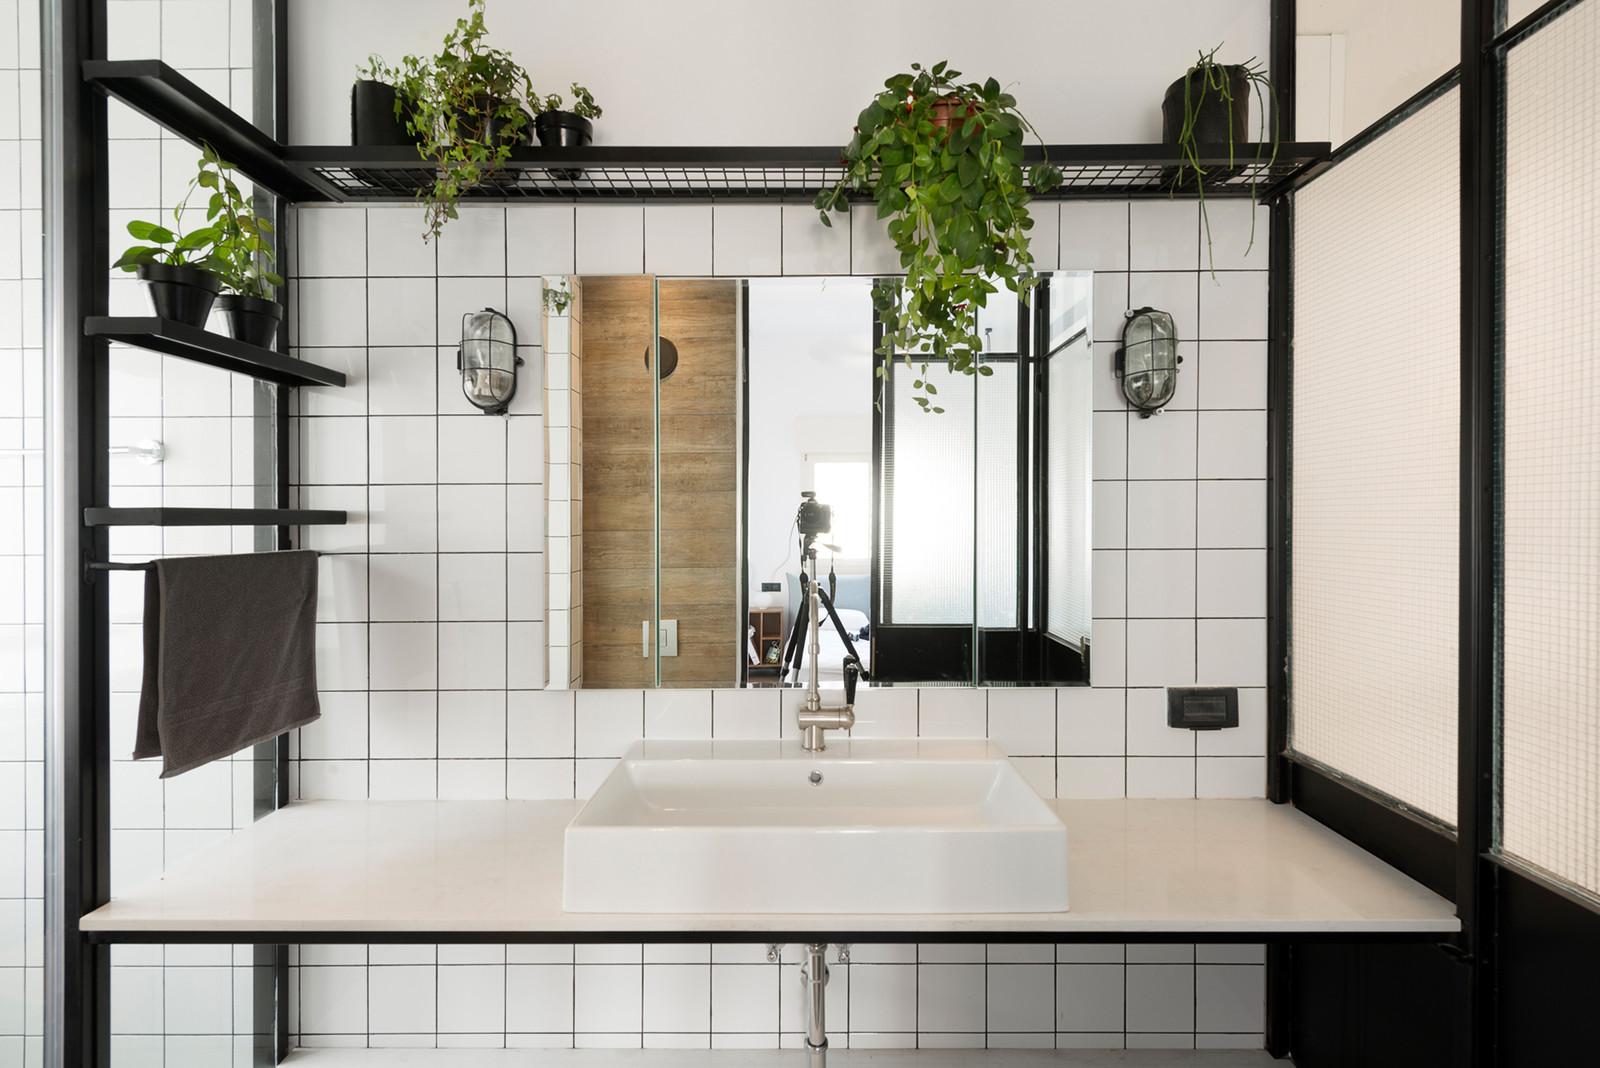 Apartment-renovation-just3ds.com-22